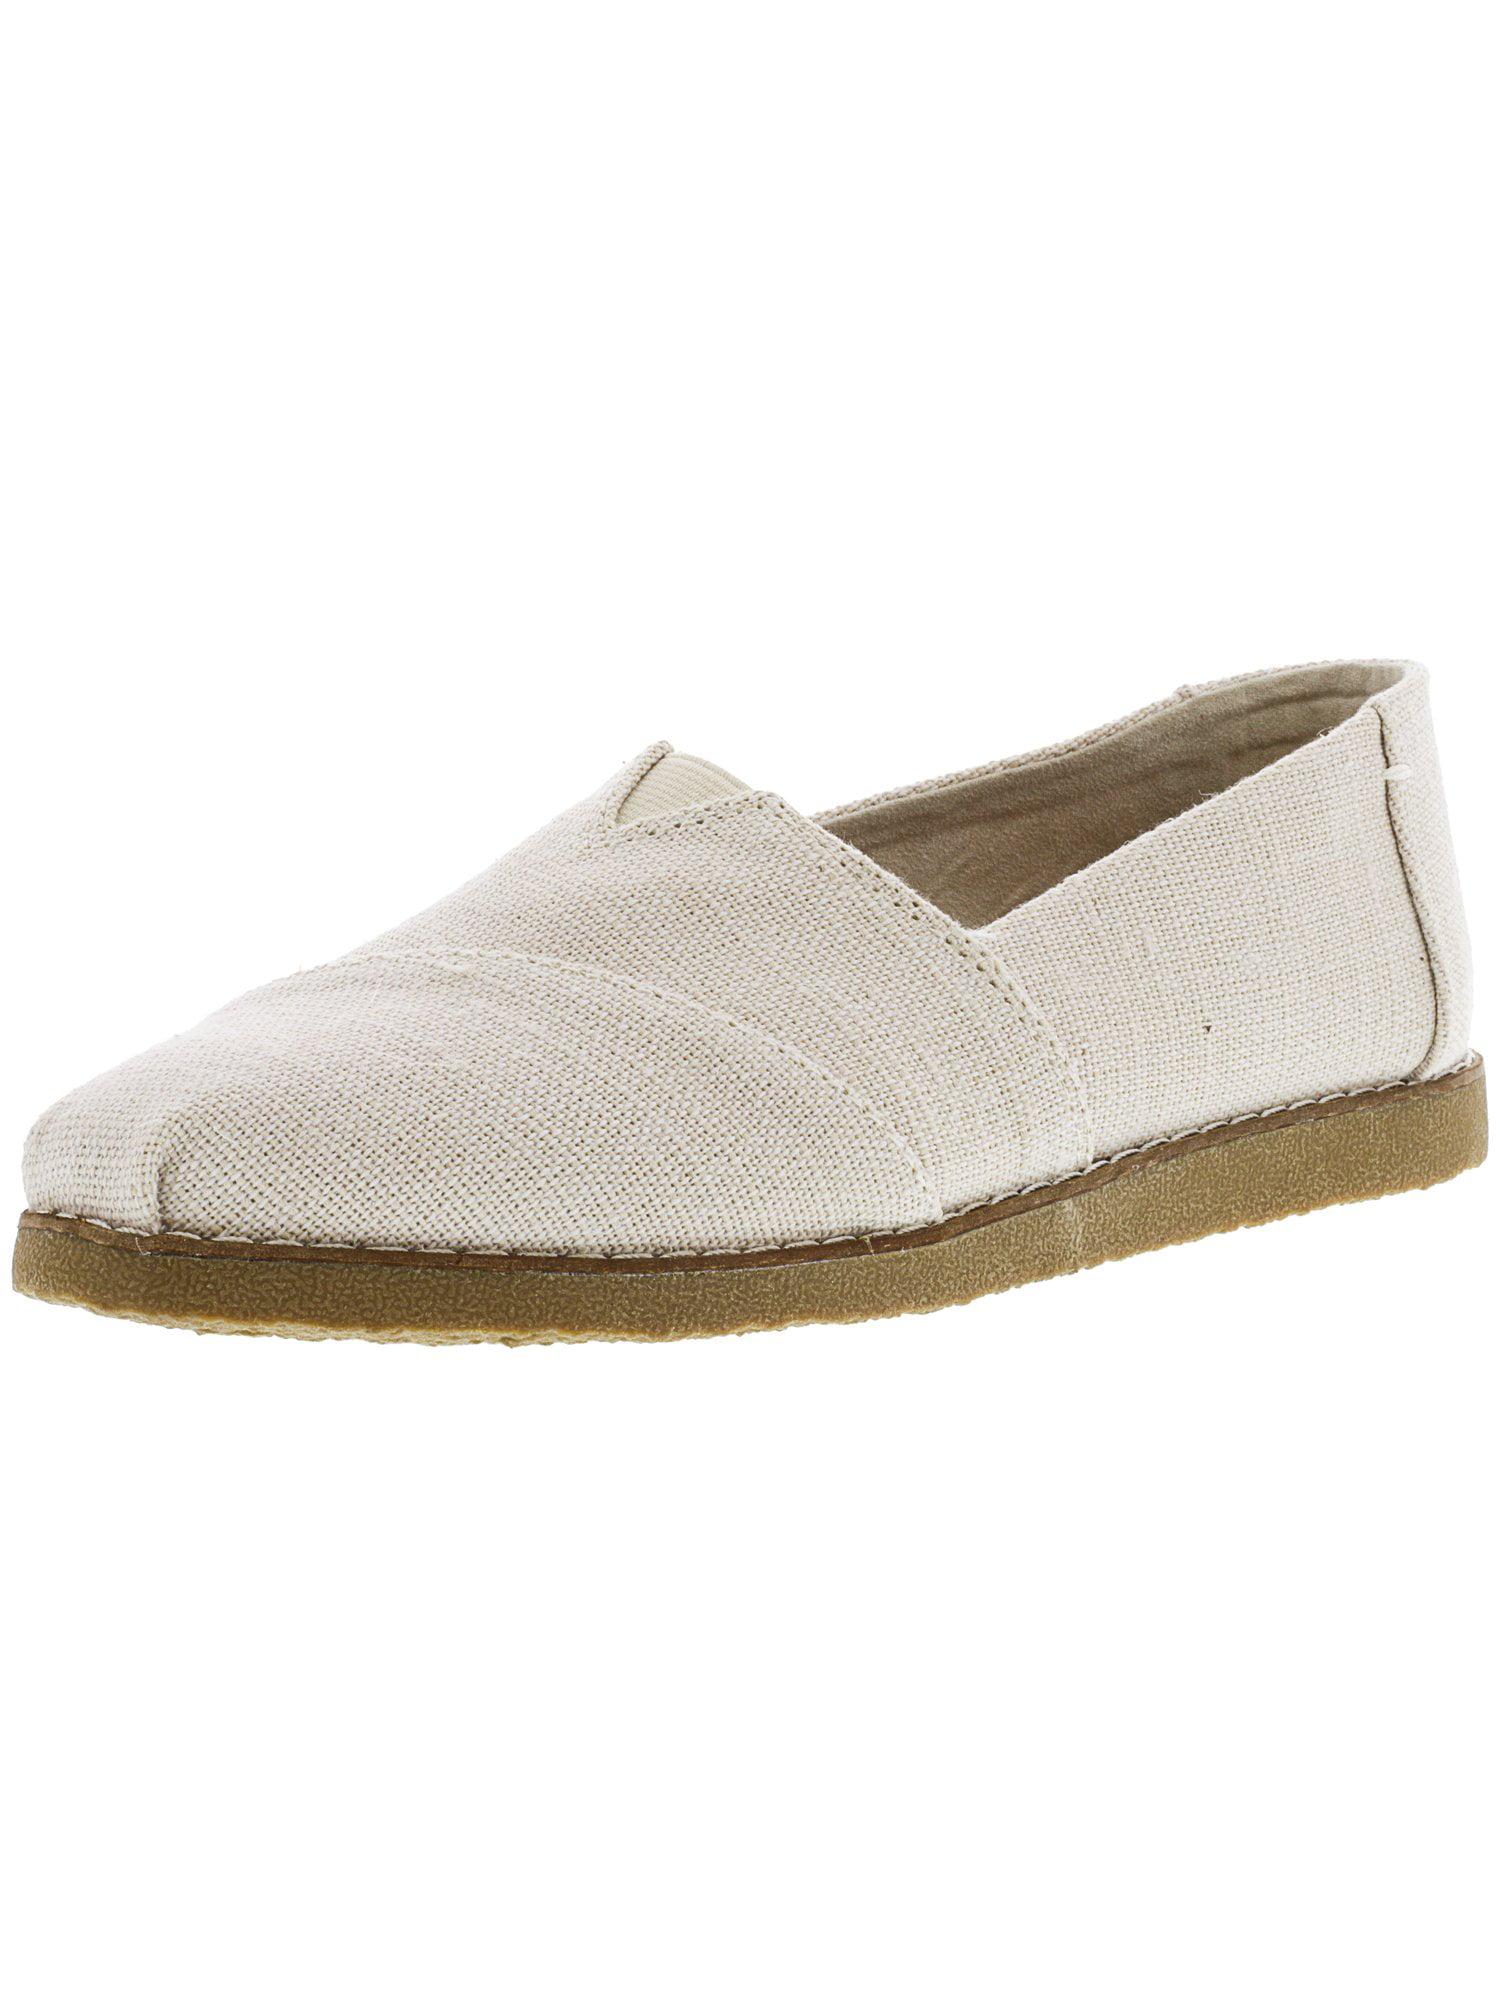 Toms Women's Alpargata Crepe Heritage Canvas Natural Ankle-High Slip-On Shoes - 9M